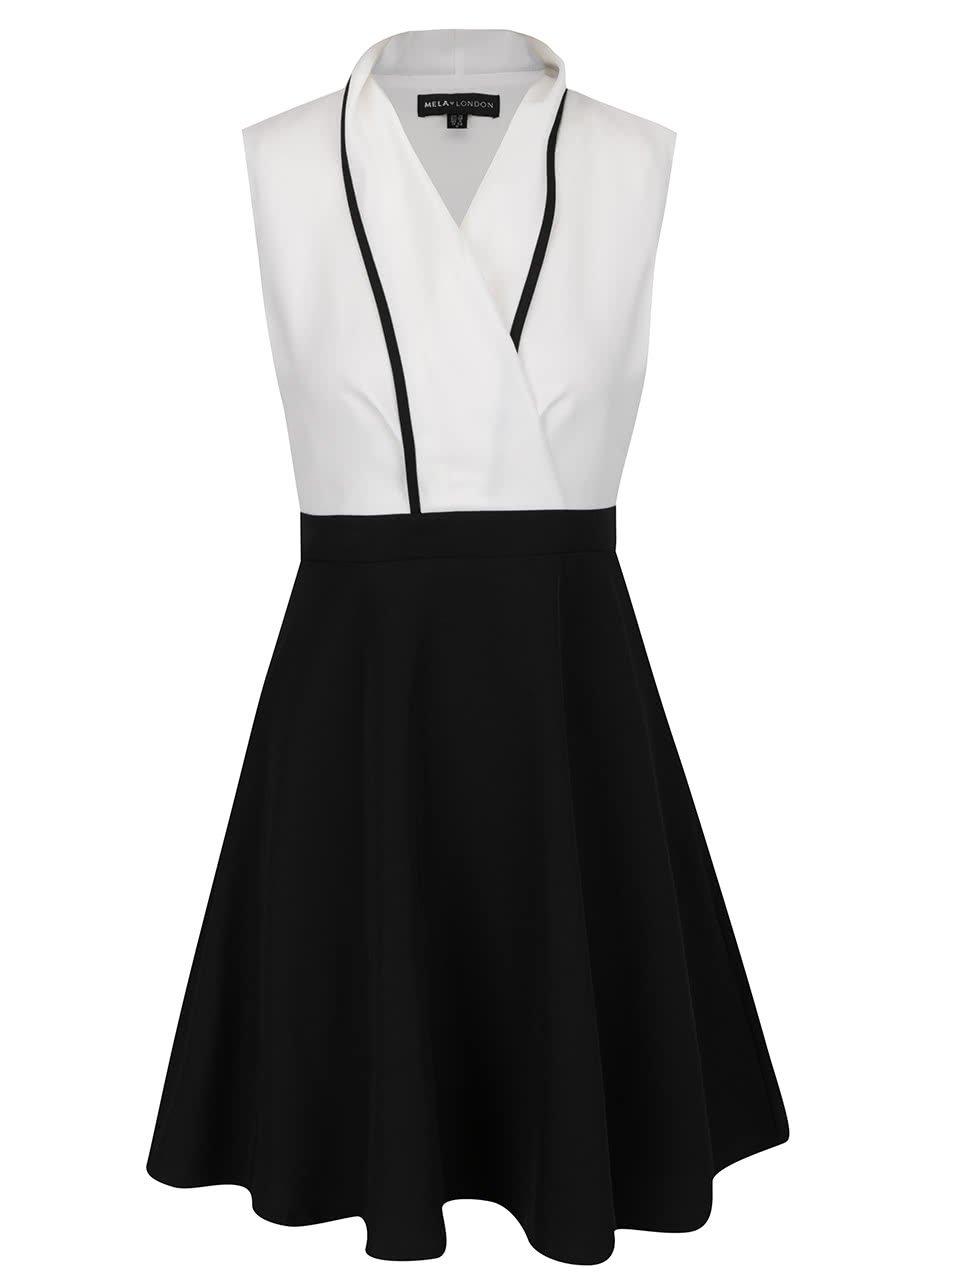 Černo-krémové šaty Mela London